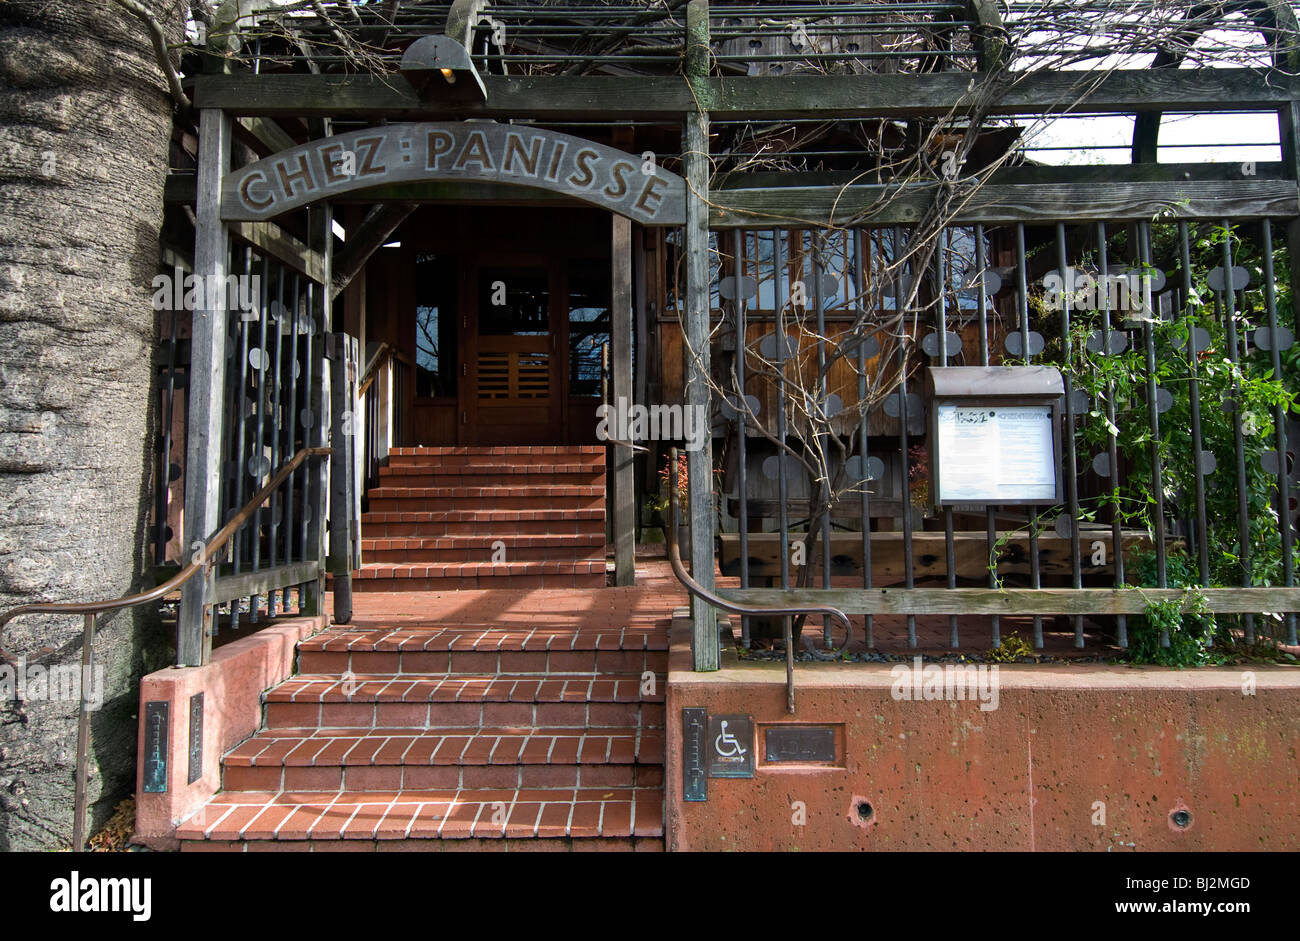 Chez Panisse Restaurant, Berkeley, California - Stock Image